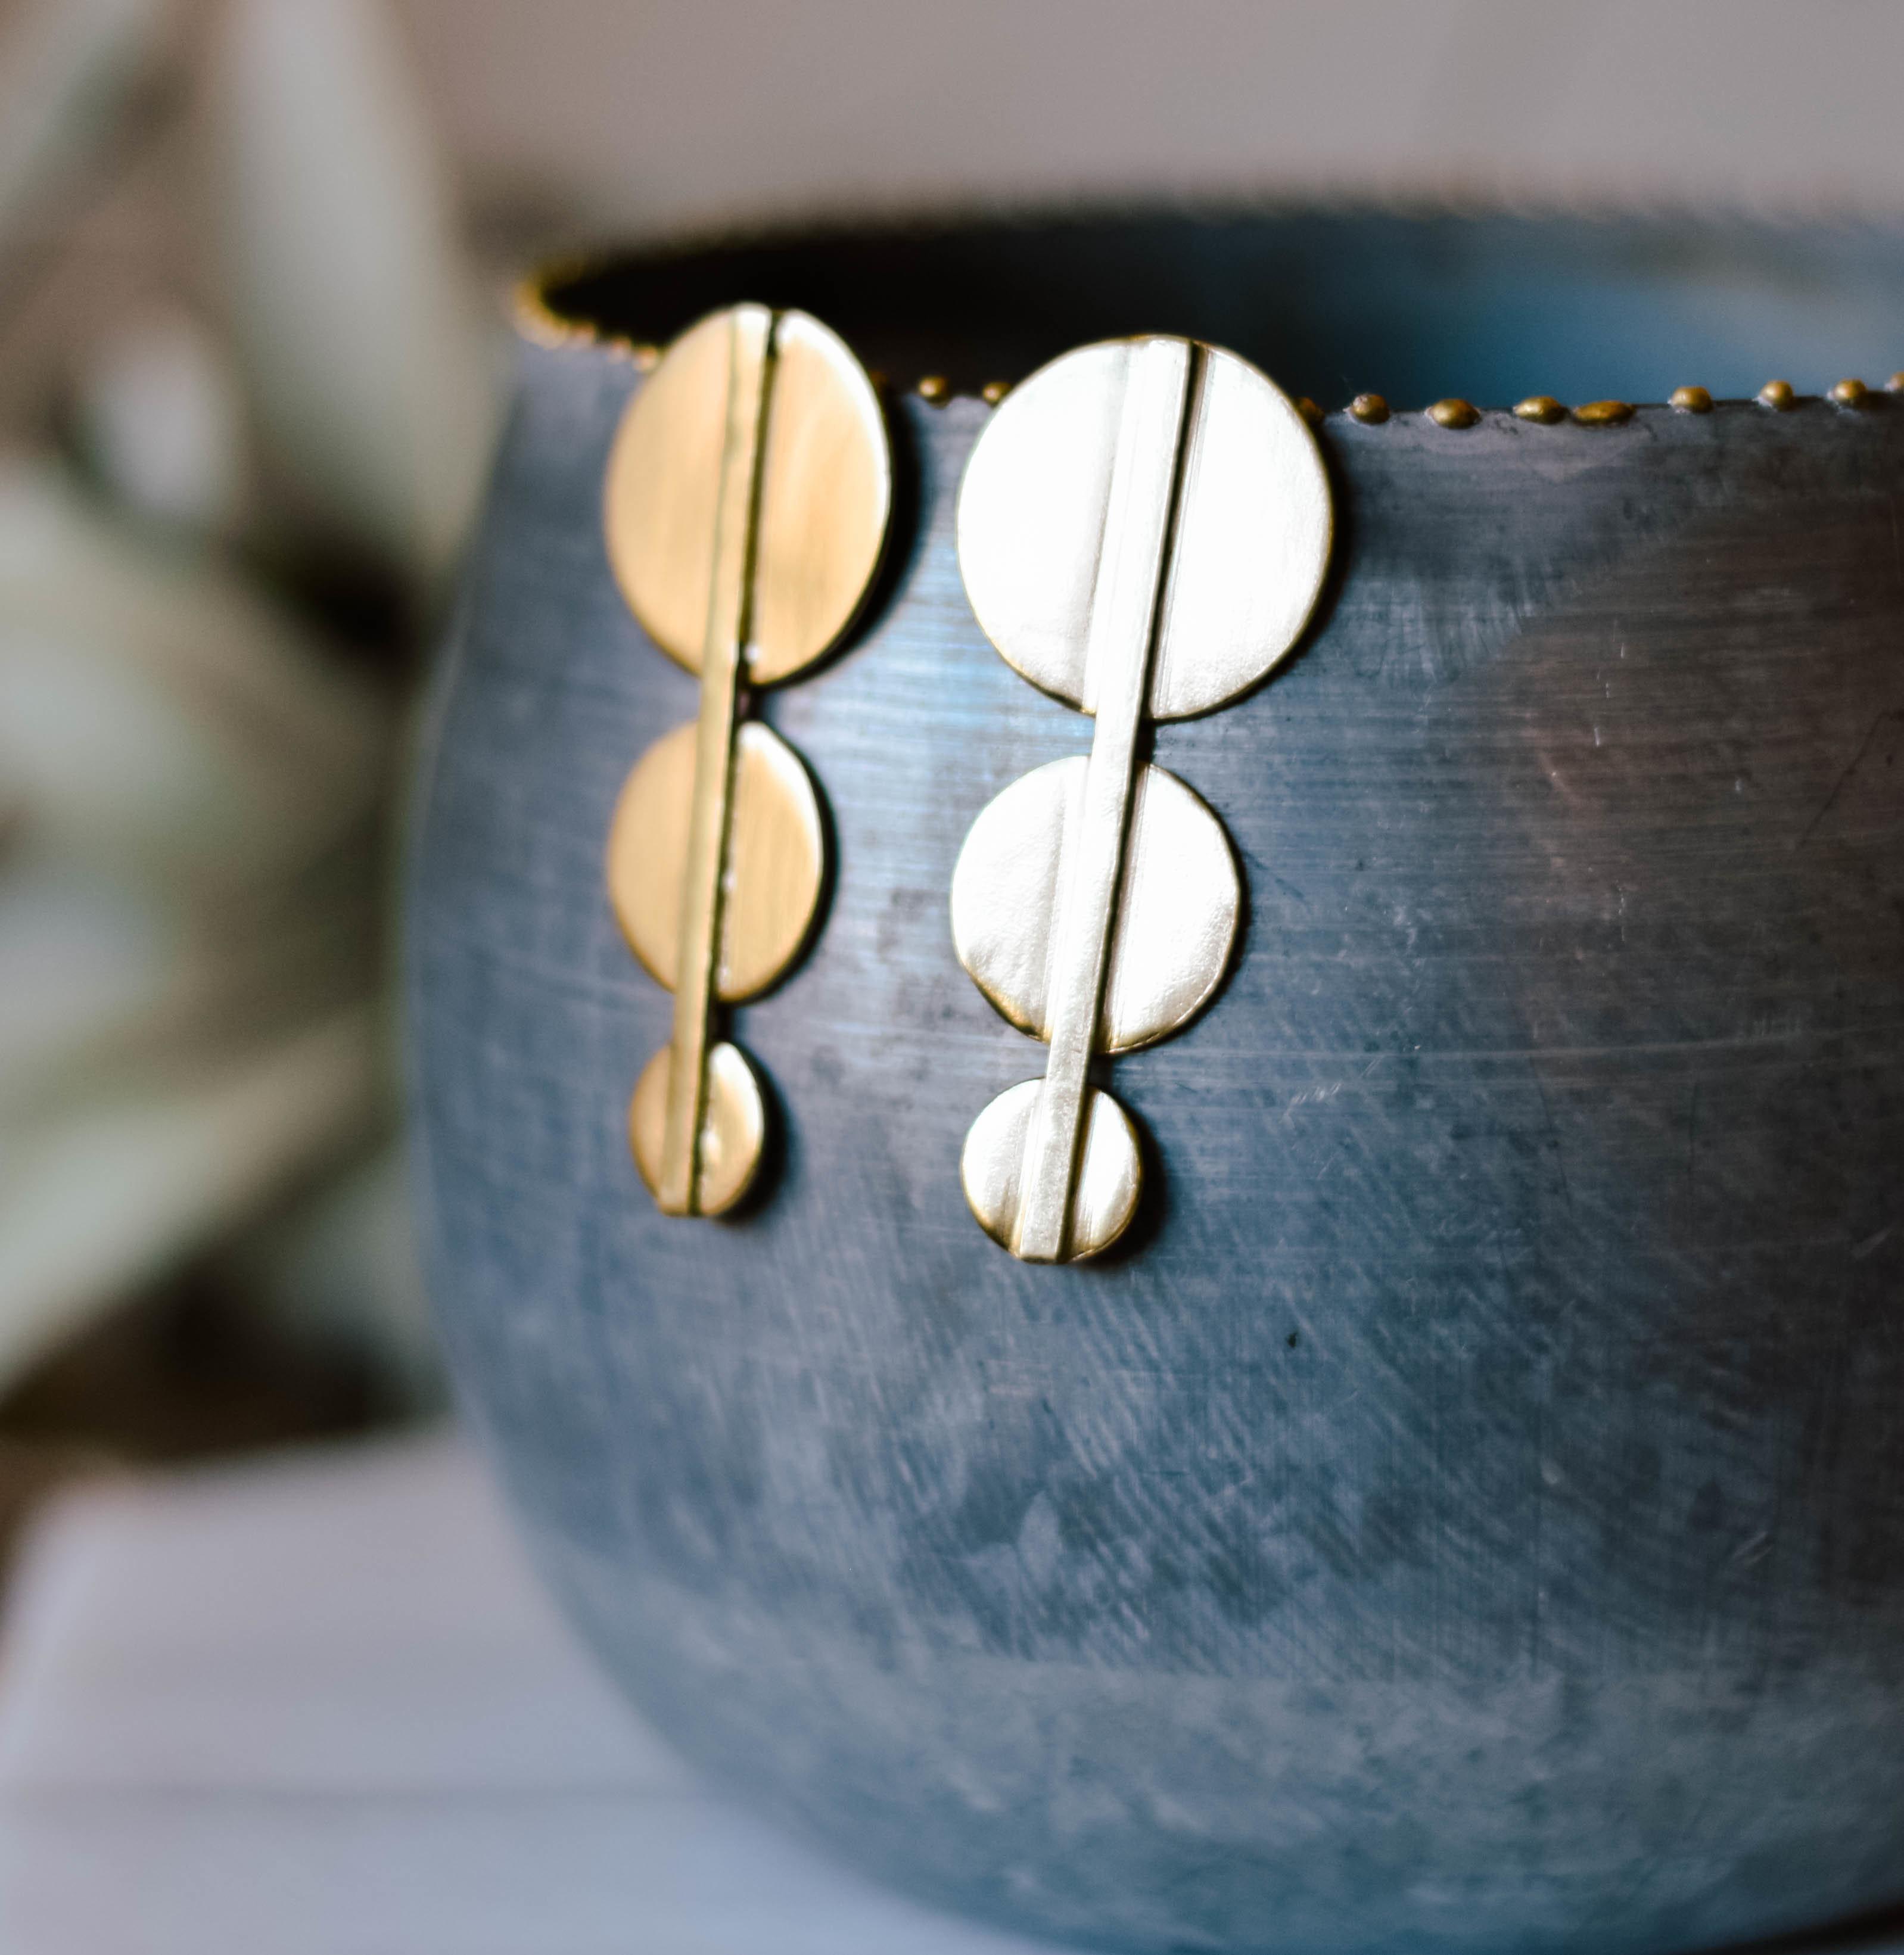 brass bar and Circle earrings Brer7001